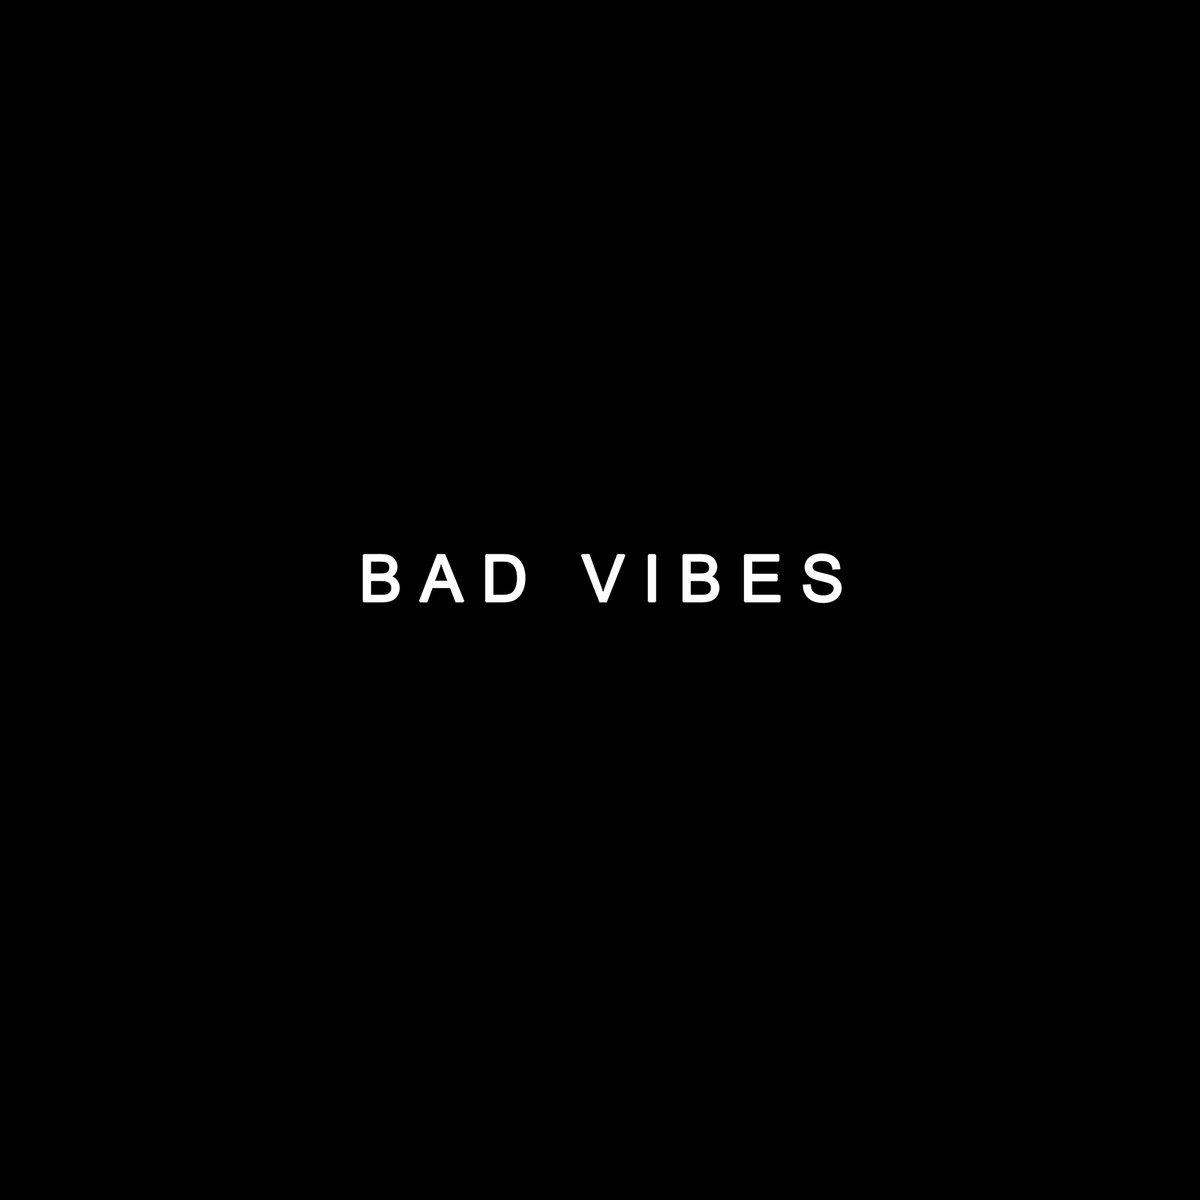 .@shlohmo - Bad Vibes - 5th Anniversary Edition Out November 11  https://t.co/R2Rg4uSiY1 https://t.co/2CiU1s7Sge